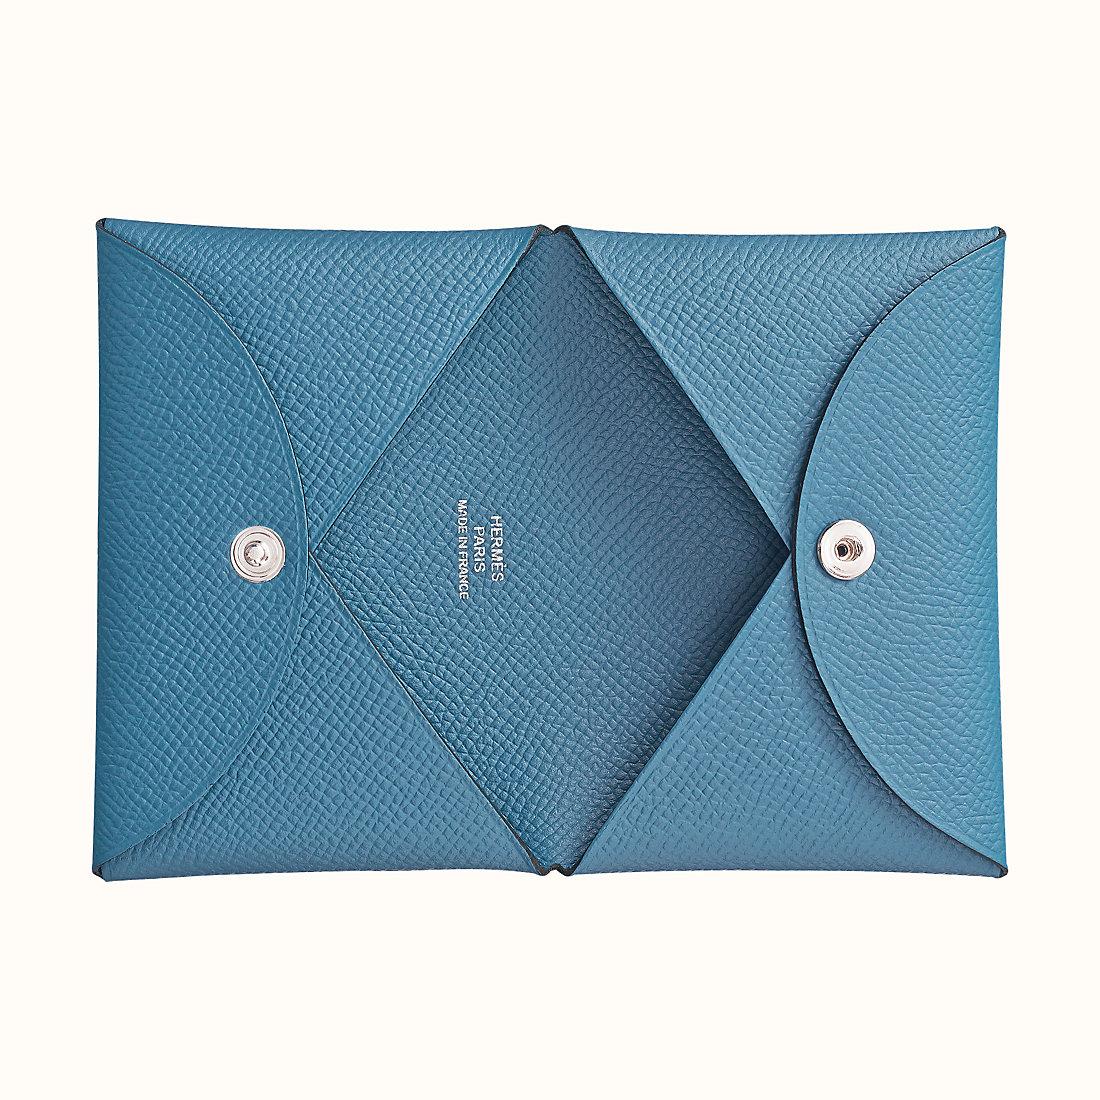 Calvi卡包價格及圖片大全 Hermes Calvi verso card holder 7R 碧藍色